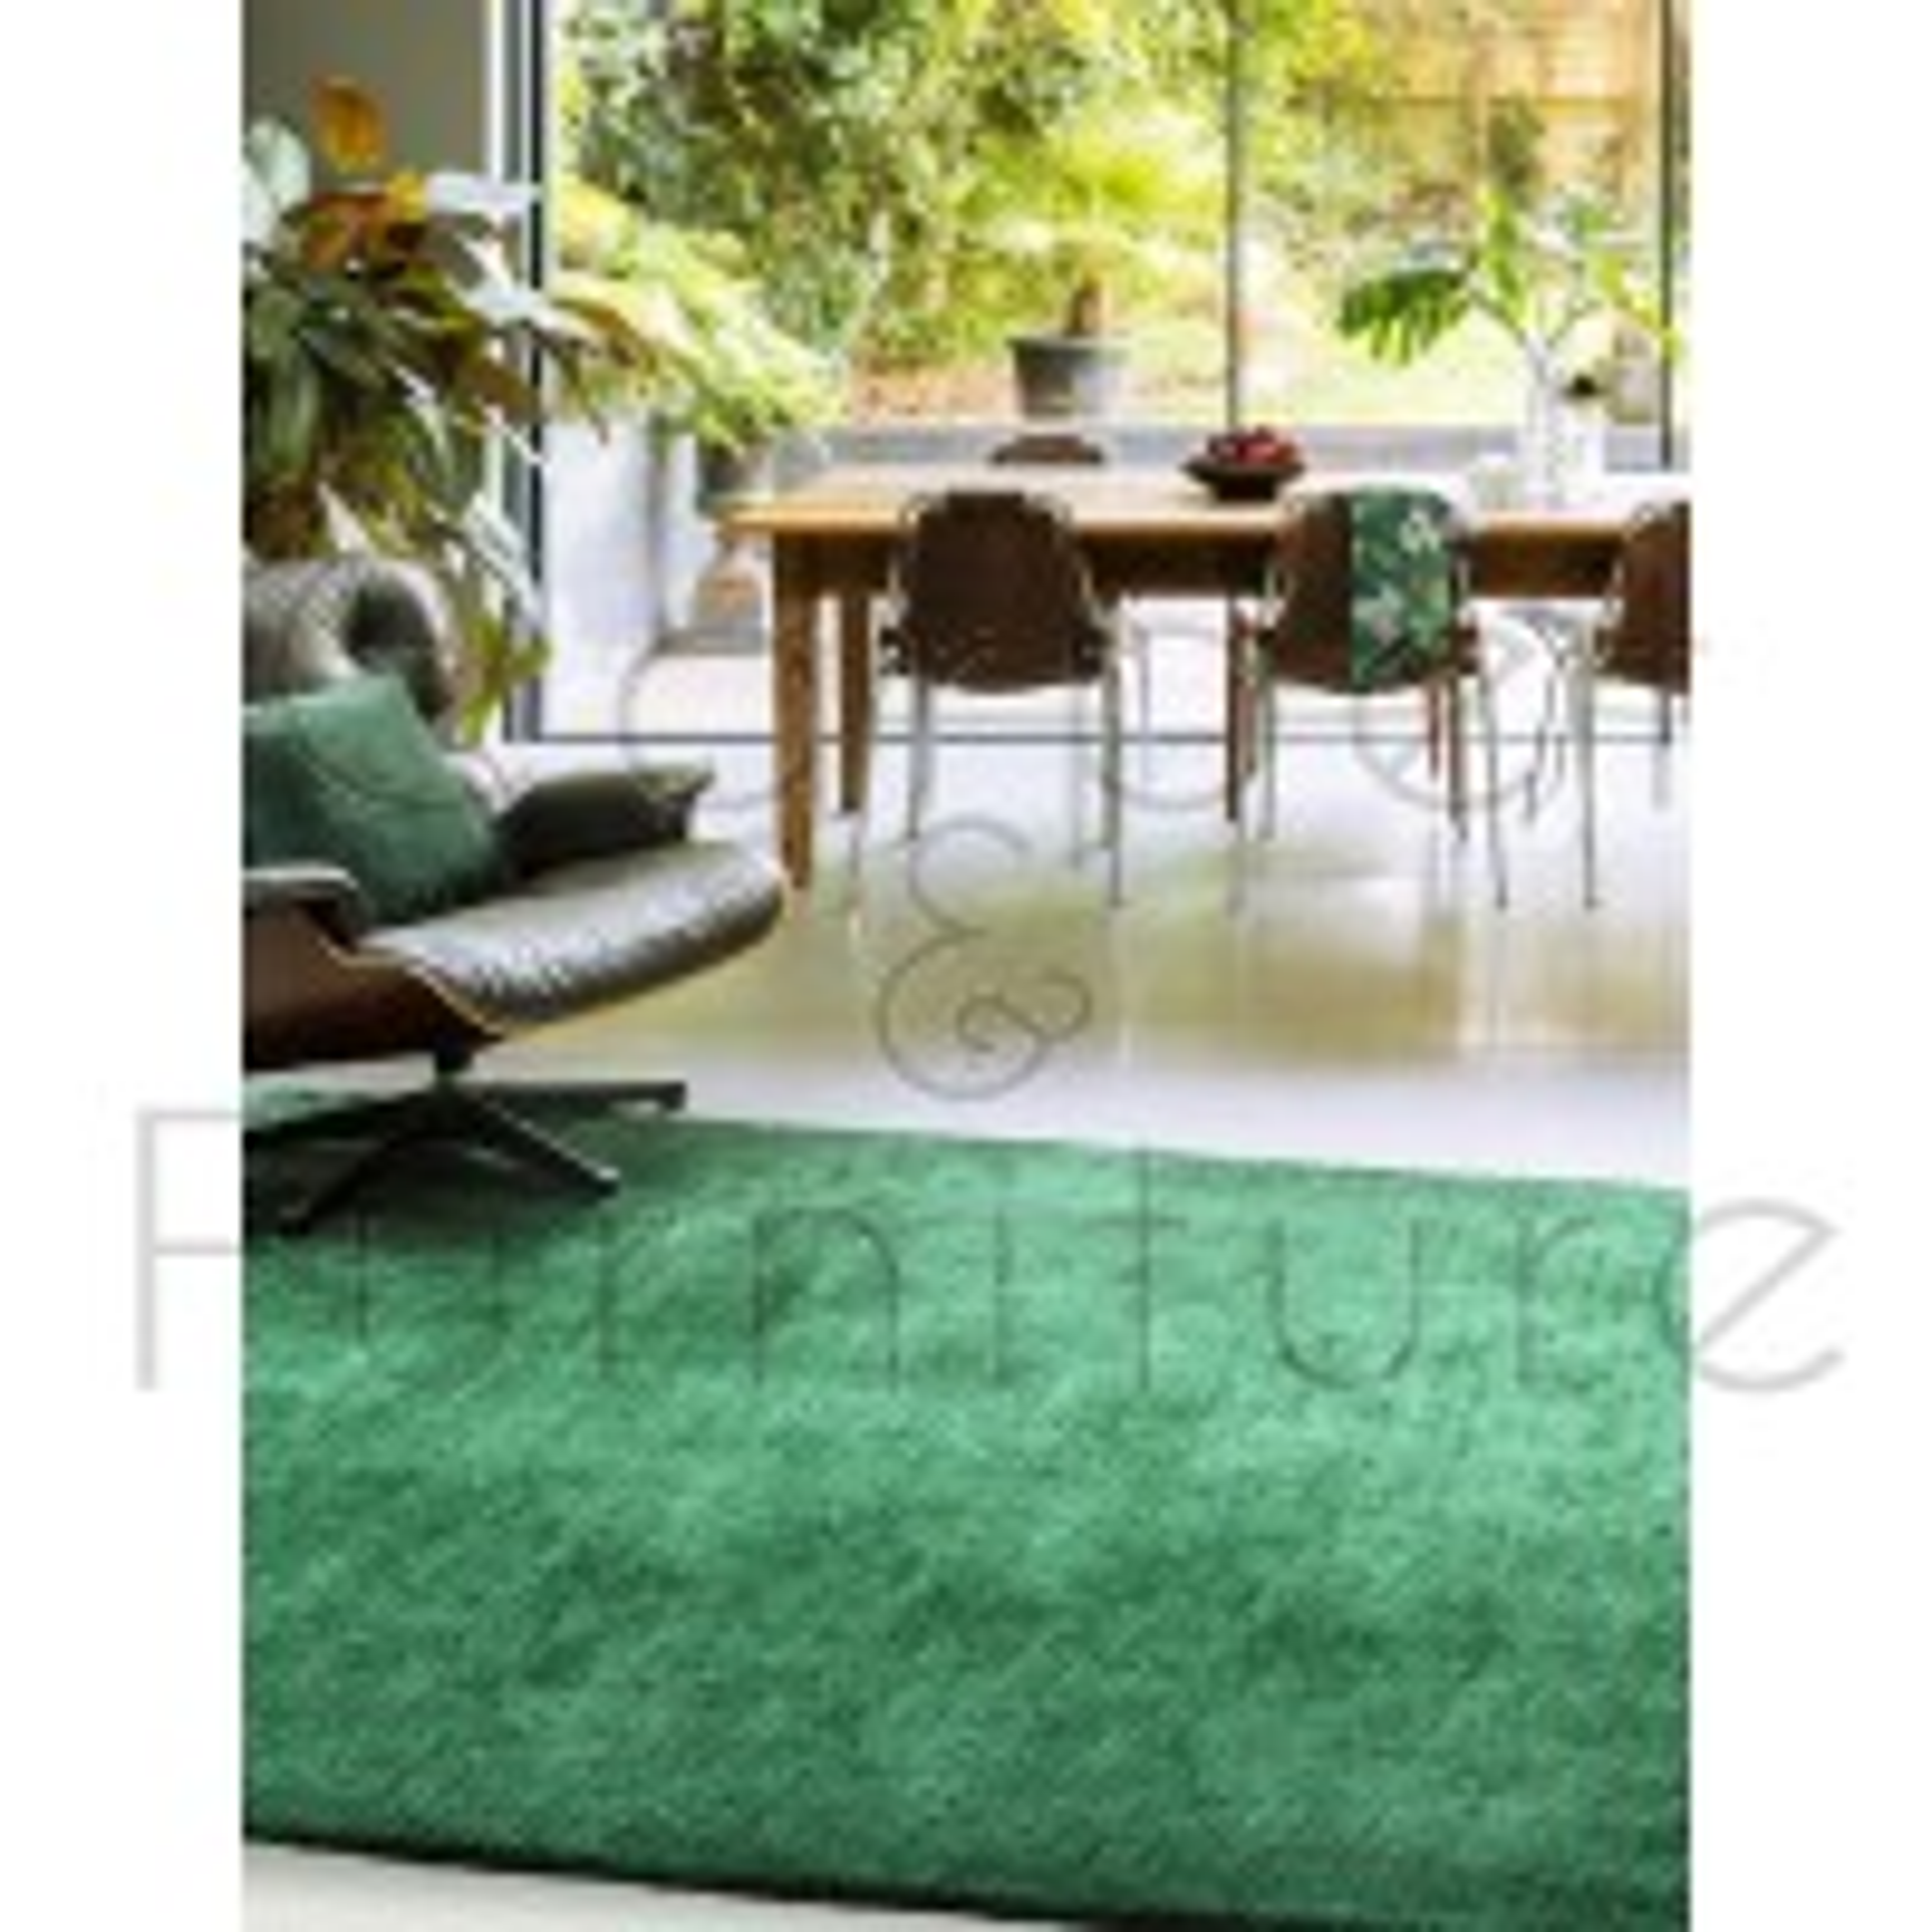 "Milo Soft Plain Rug - Green - Size 200 x 290 cm (6'7"" x 9'6"")"